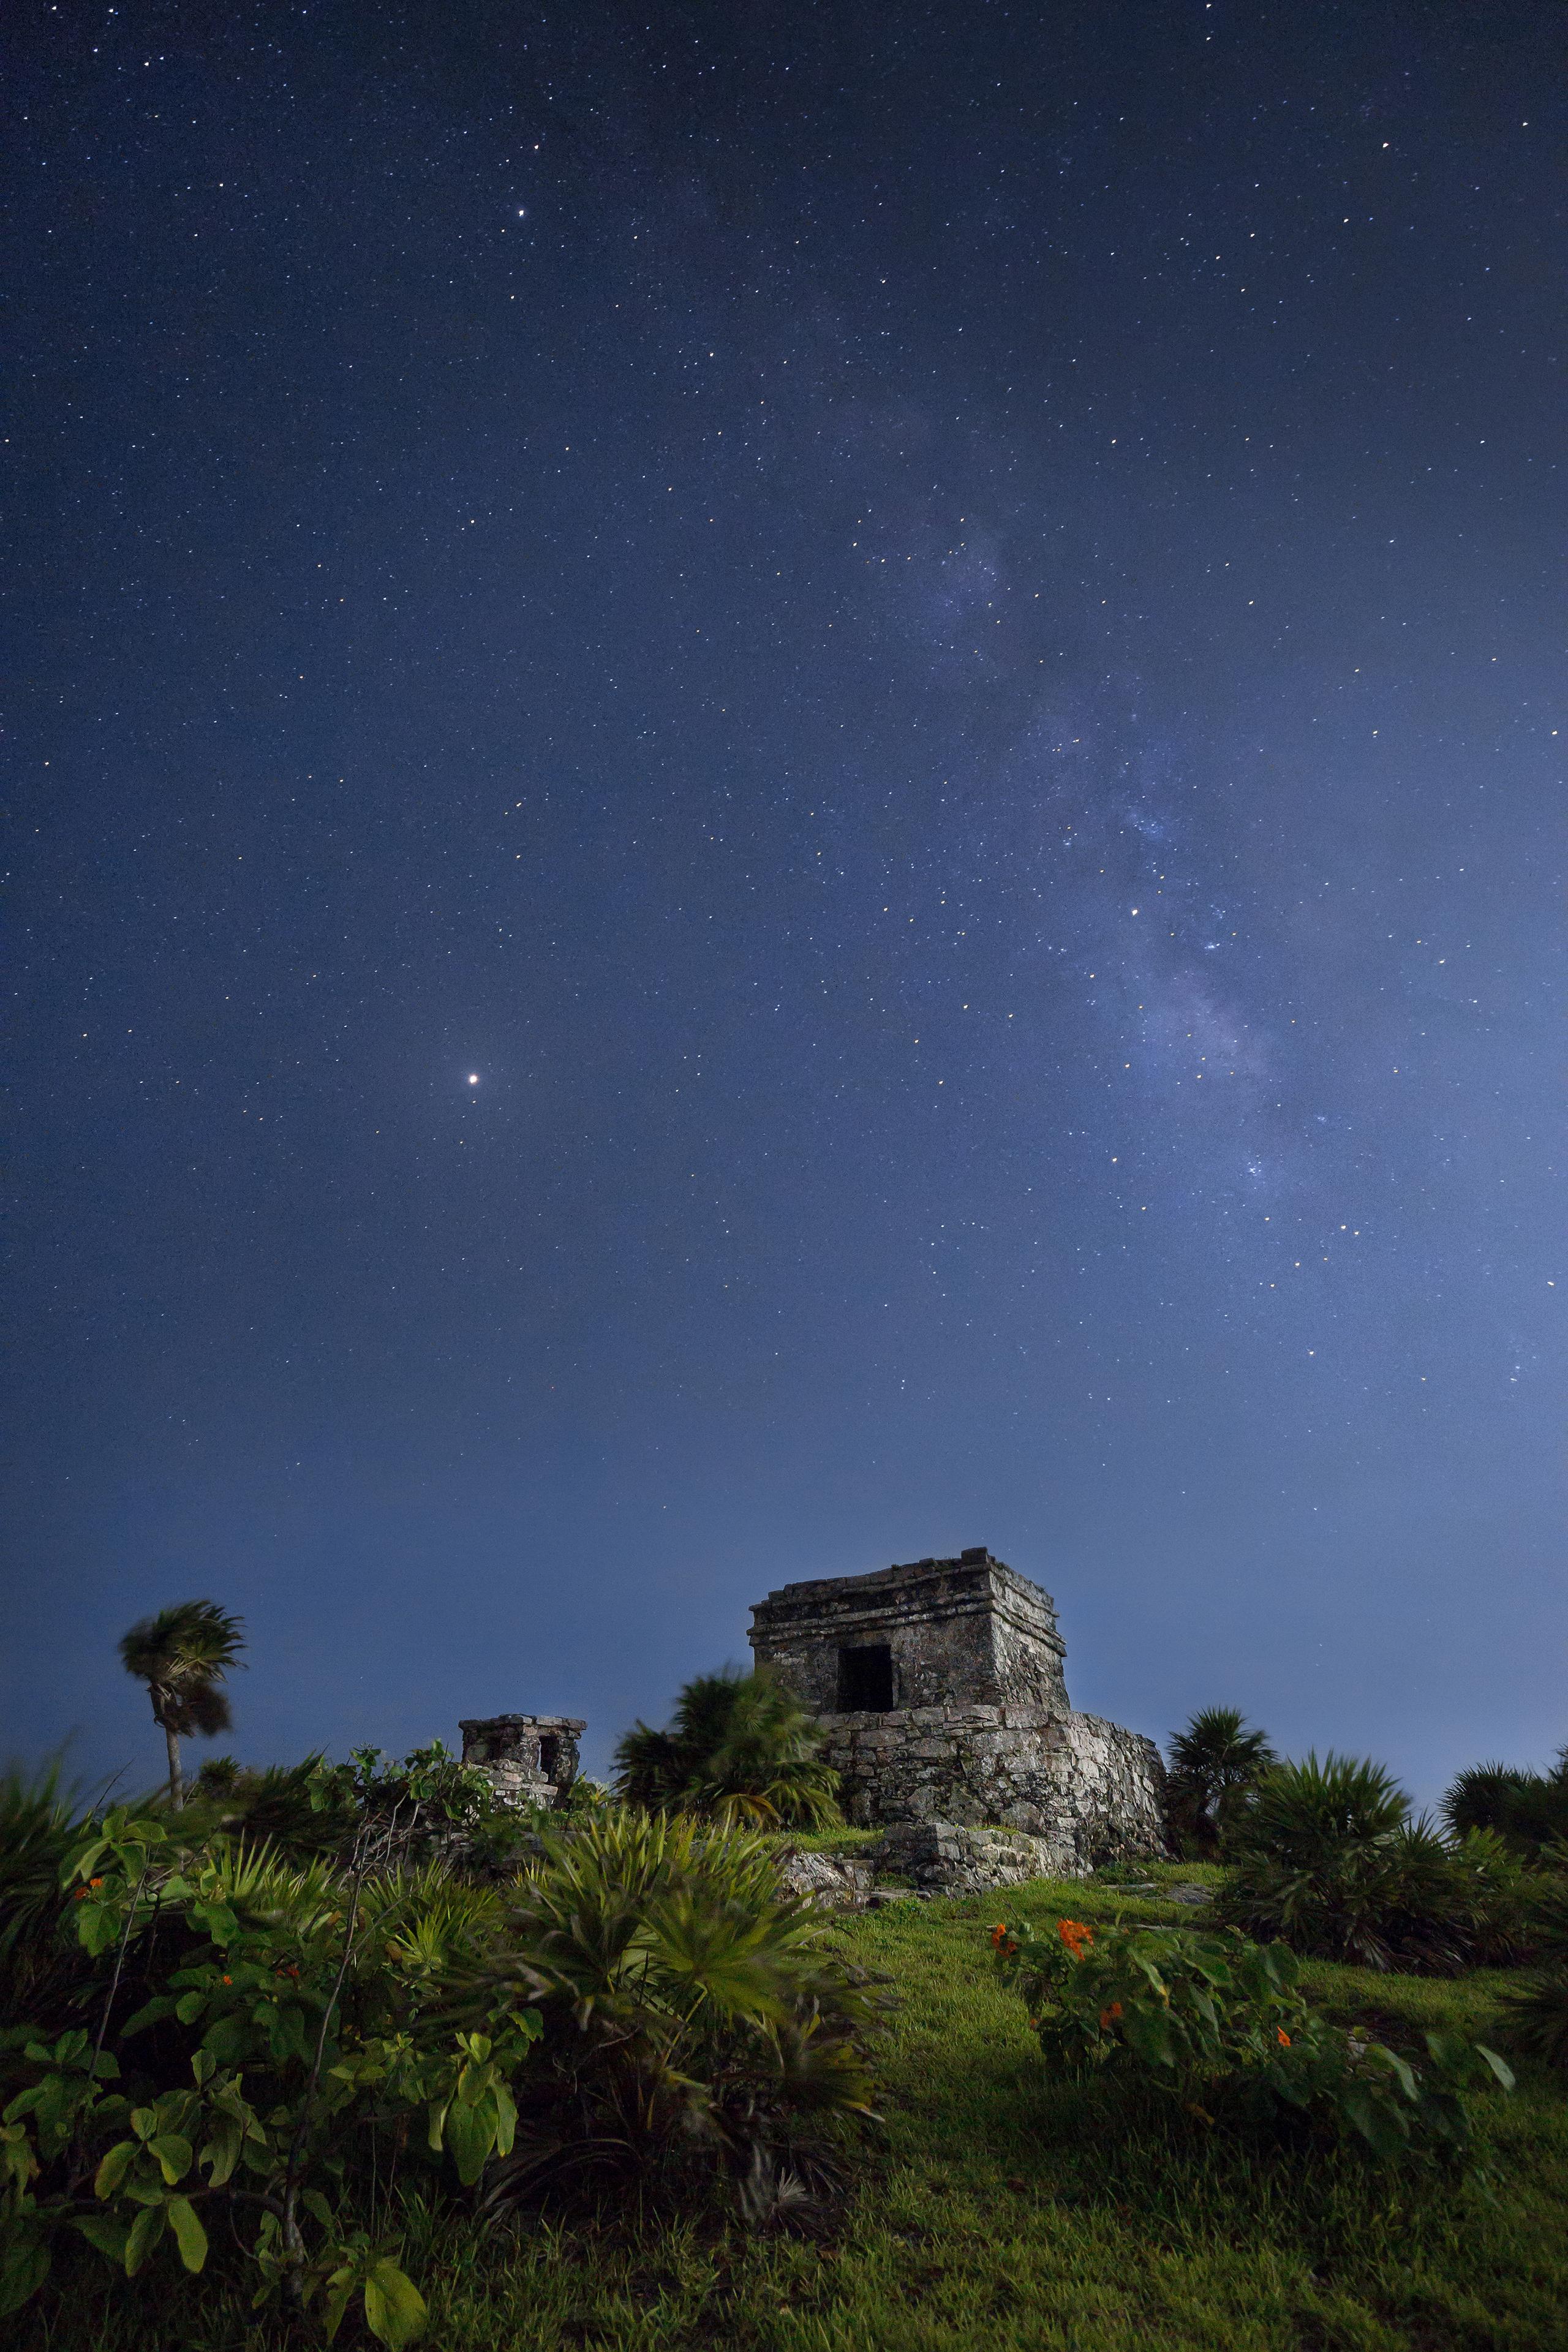 tulum-ruins-stars-2-mexico-sina-falker